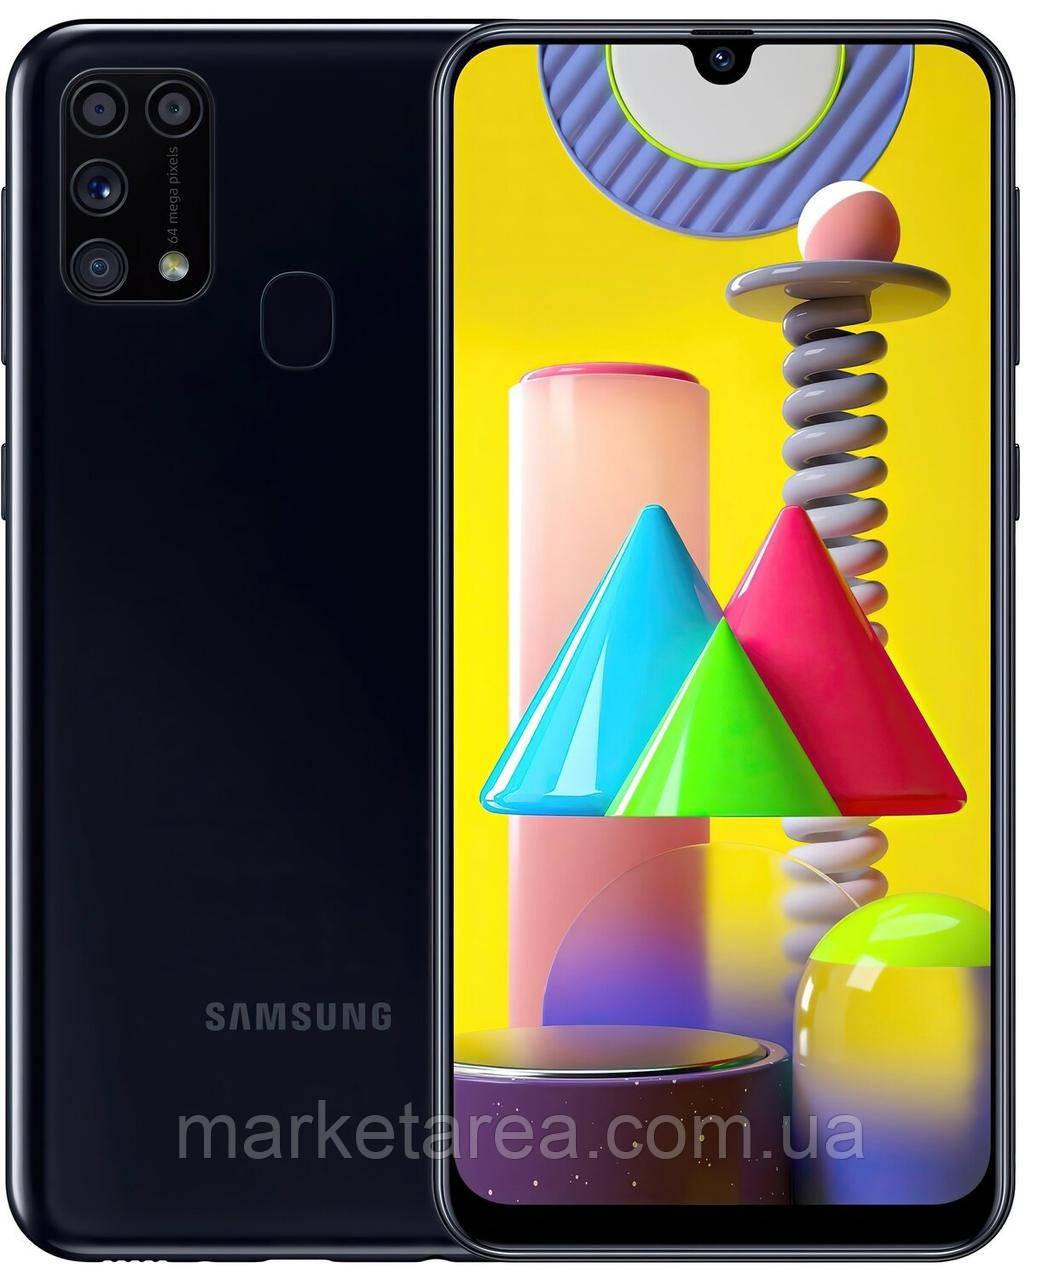 Смартфон с нфс модулем и емким аккумулятором Samsung Galaxy M31 6/128Gb Black Global NFC (Гарантия 12 мес)